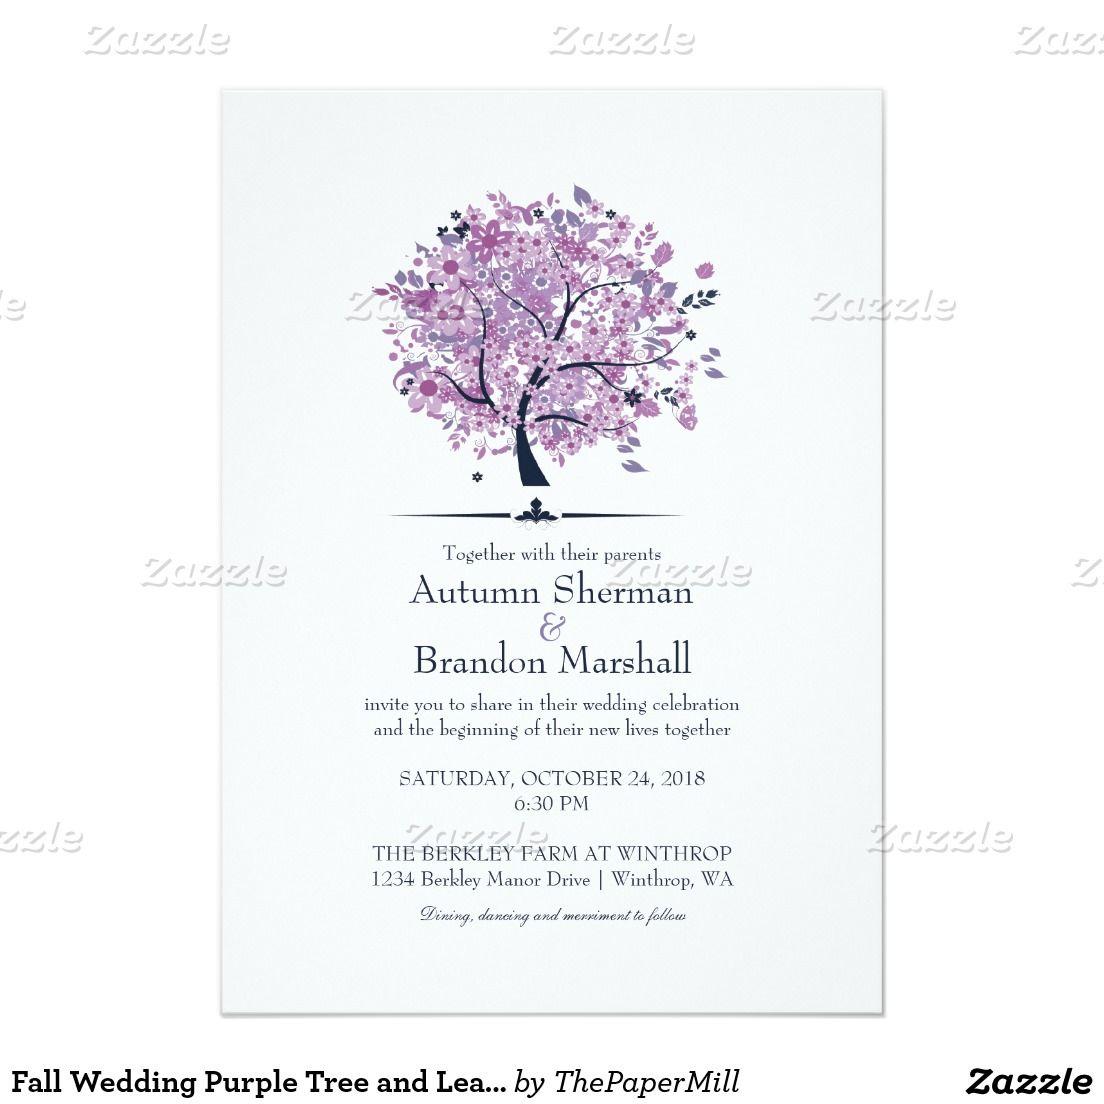 Wedding decorations purple october 2018 Fall Wedding Purple Tree and Leaves x Paper Invitation Card